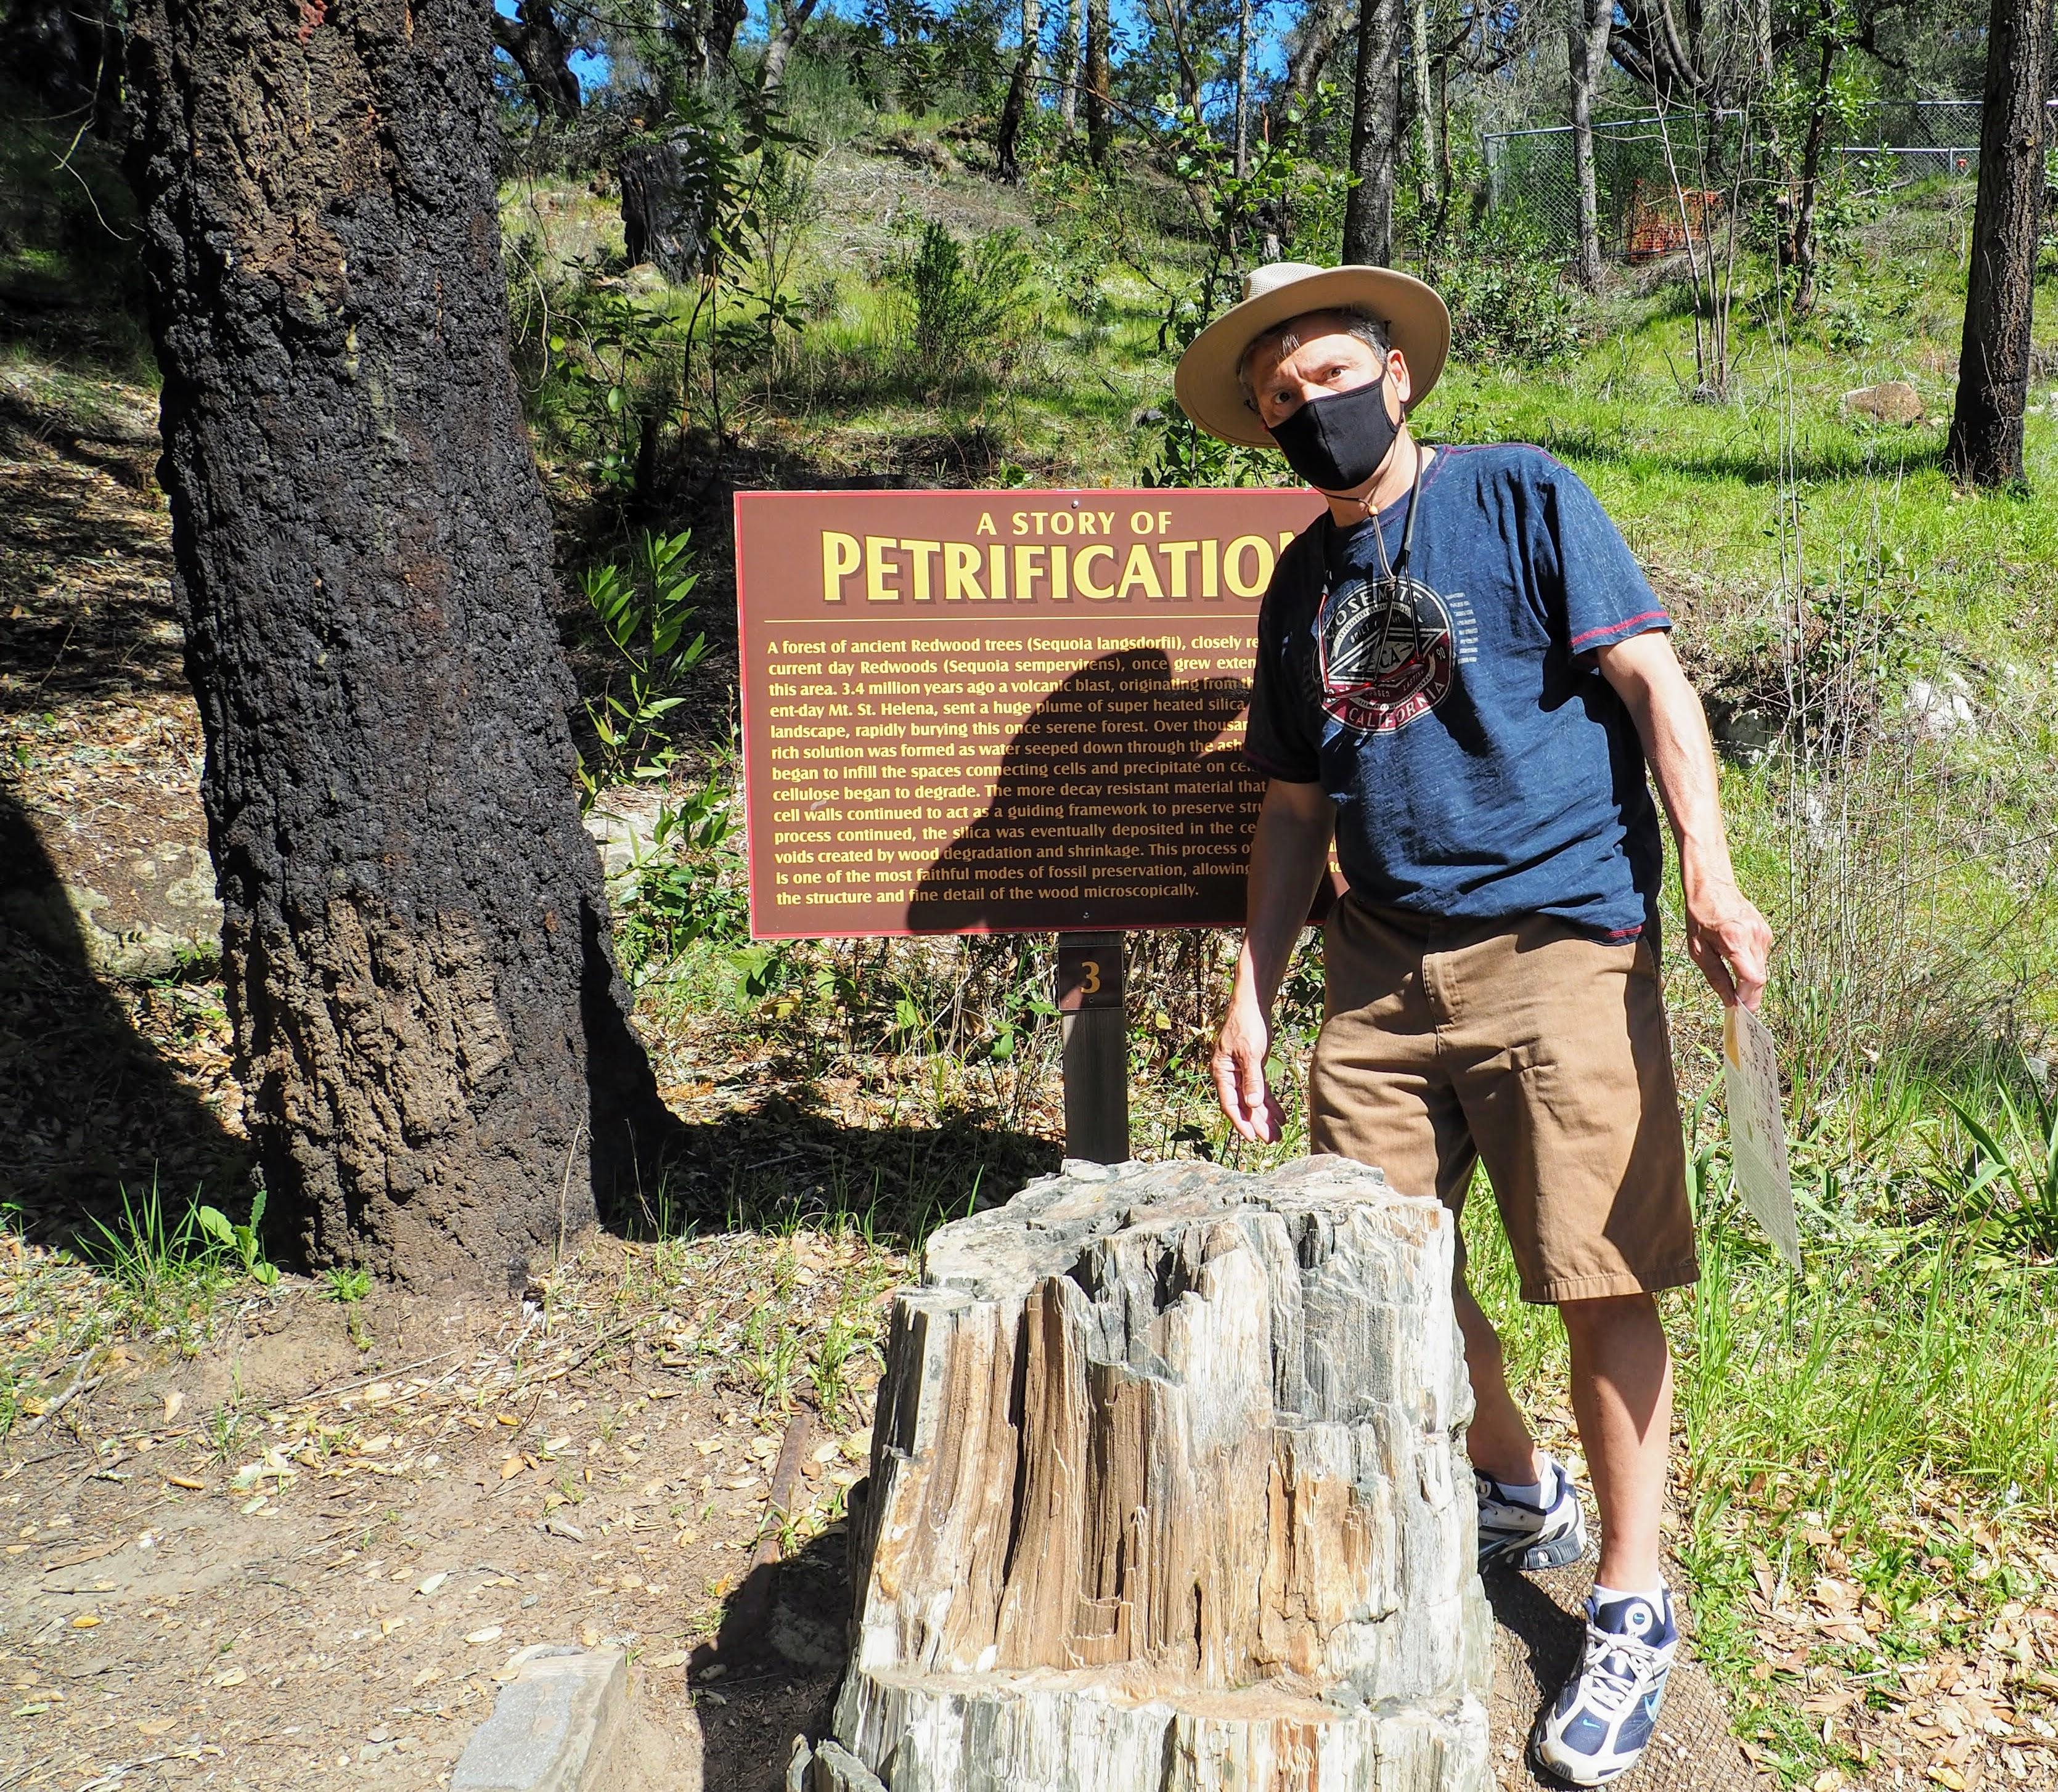 Glenn at Calistoga Petrified Forest